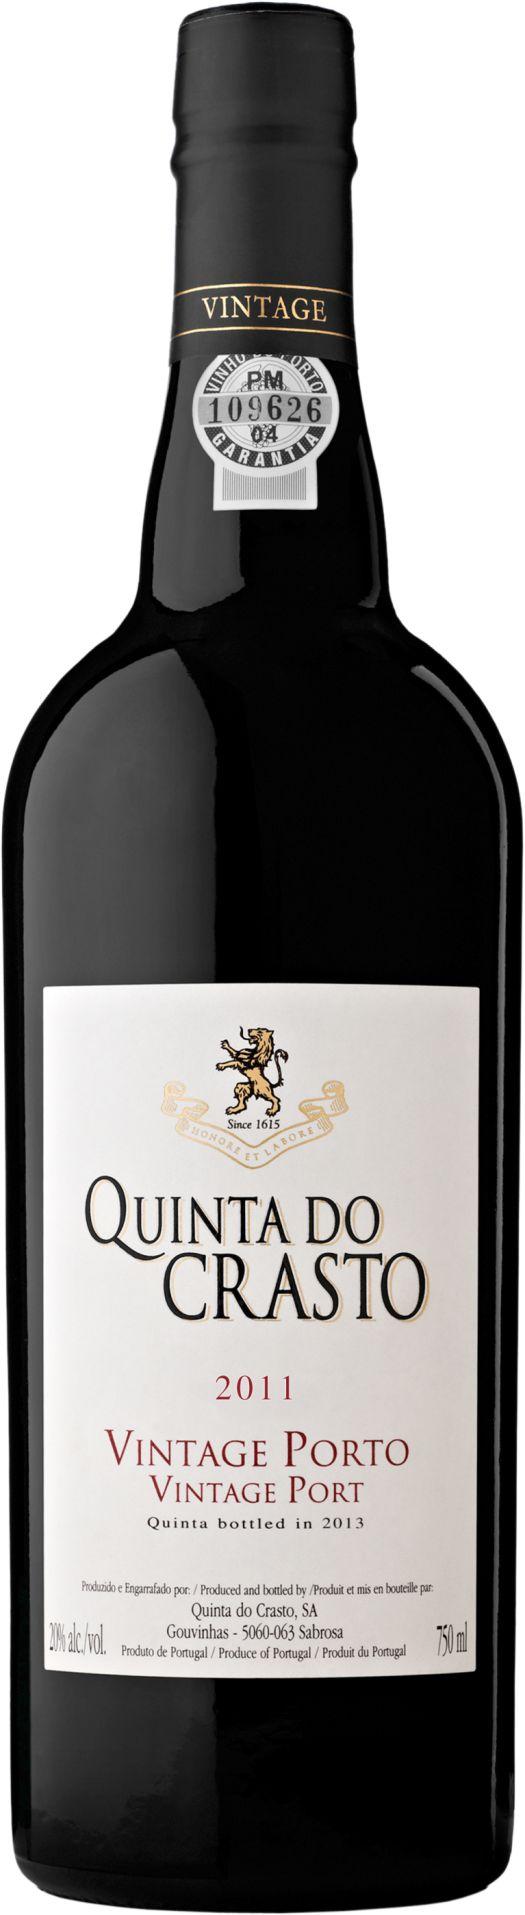 Quinta do Crasto Porto Vintage 2011 Quinta bottled in 2013